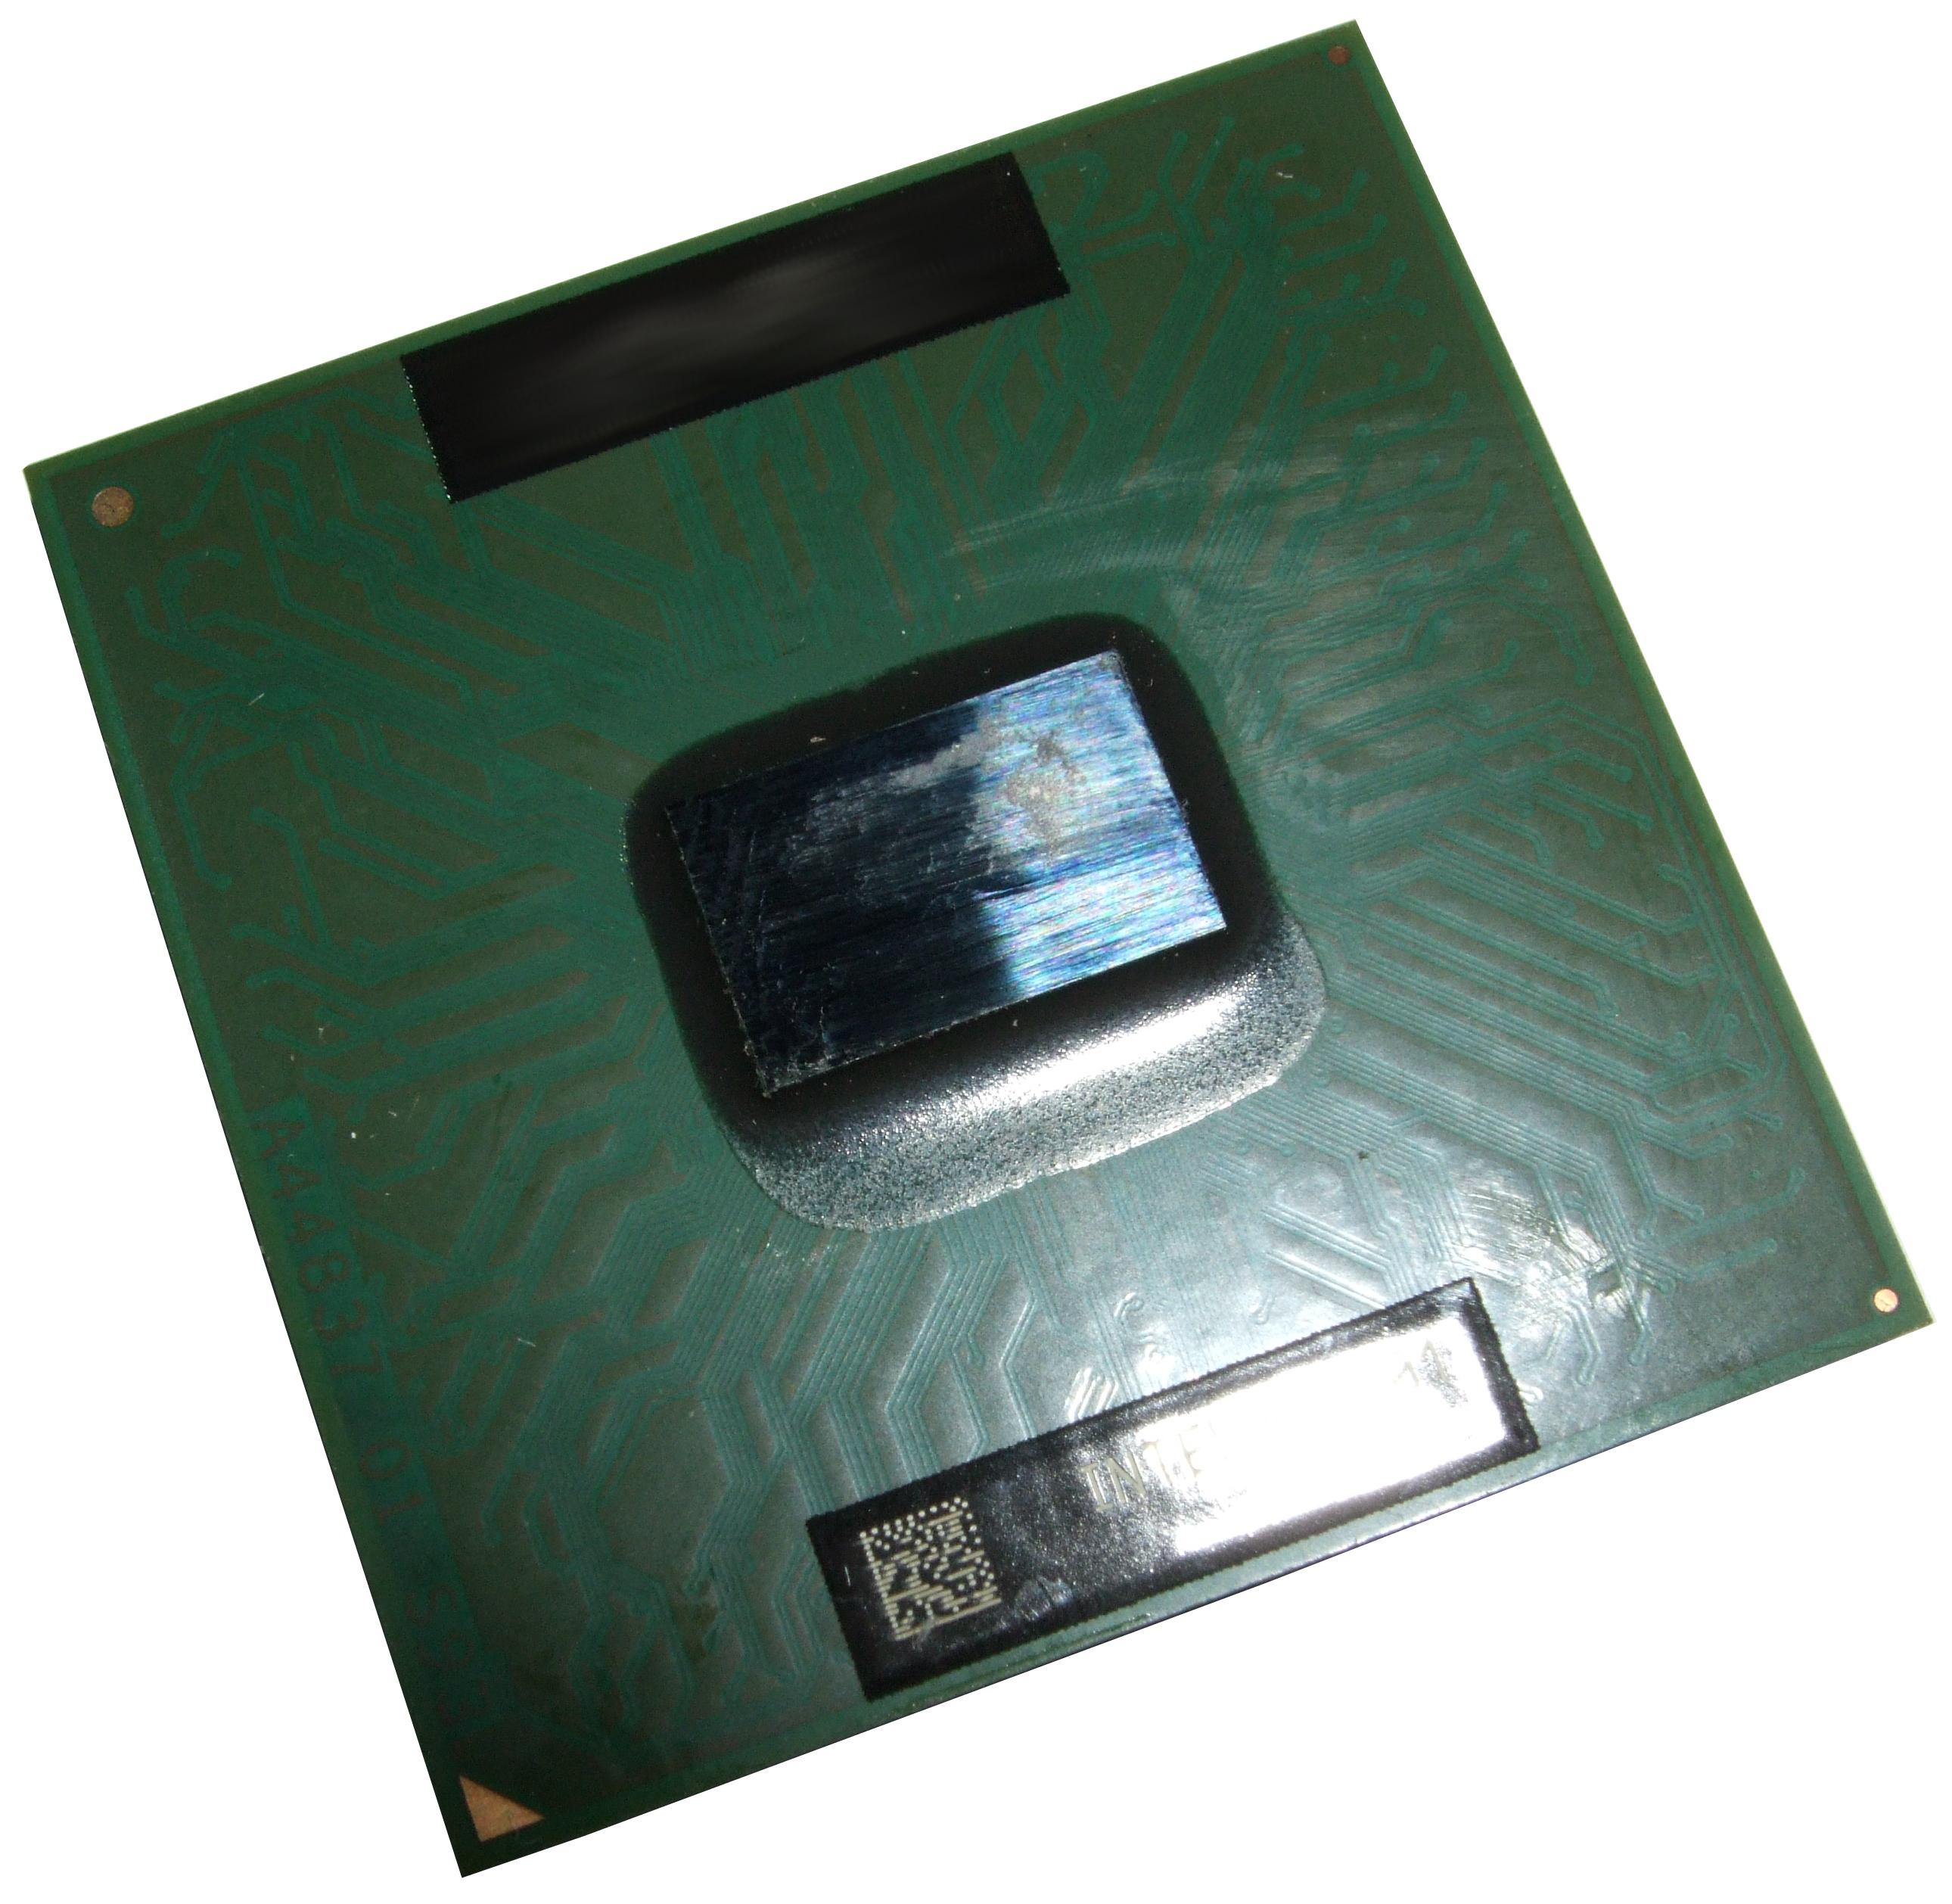 SLA49 Intel Core 2 Duo Mobile T7250 2.0GHz/2M/800 Socket P